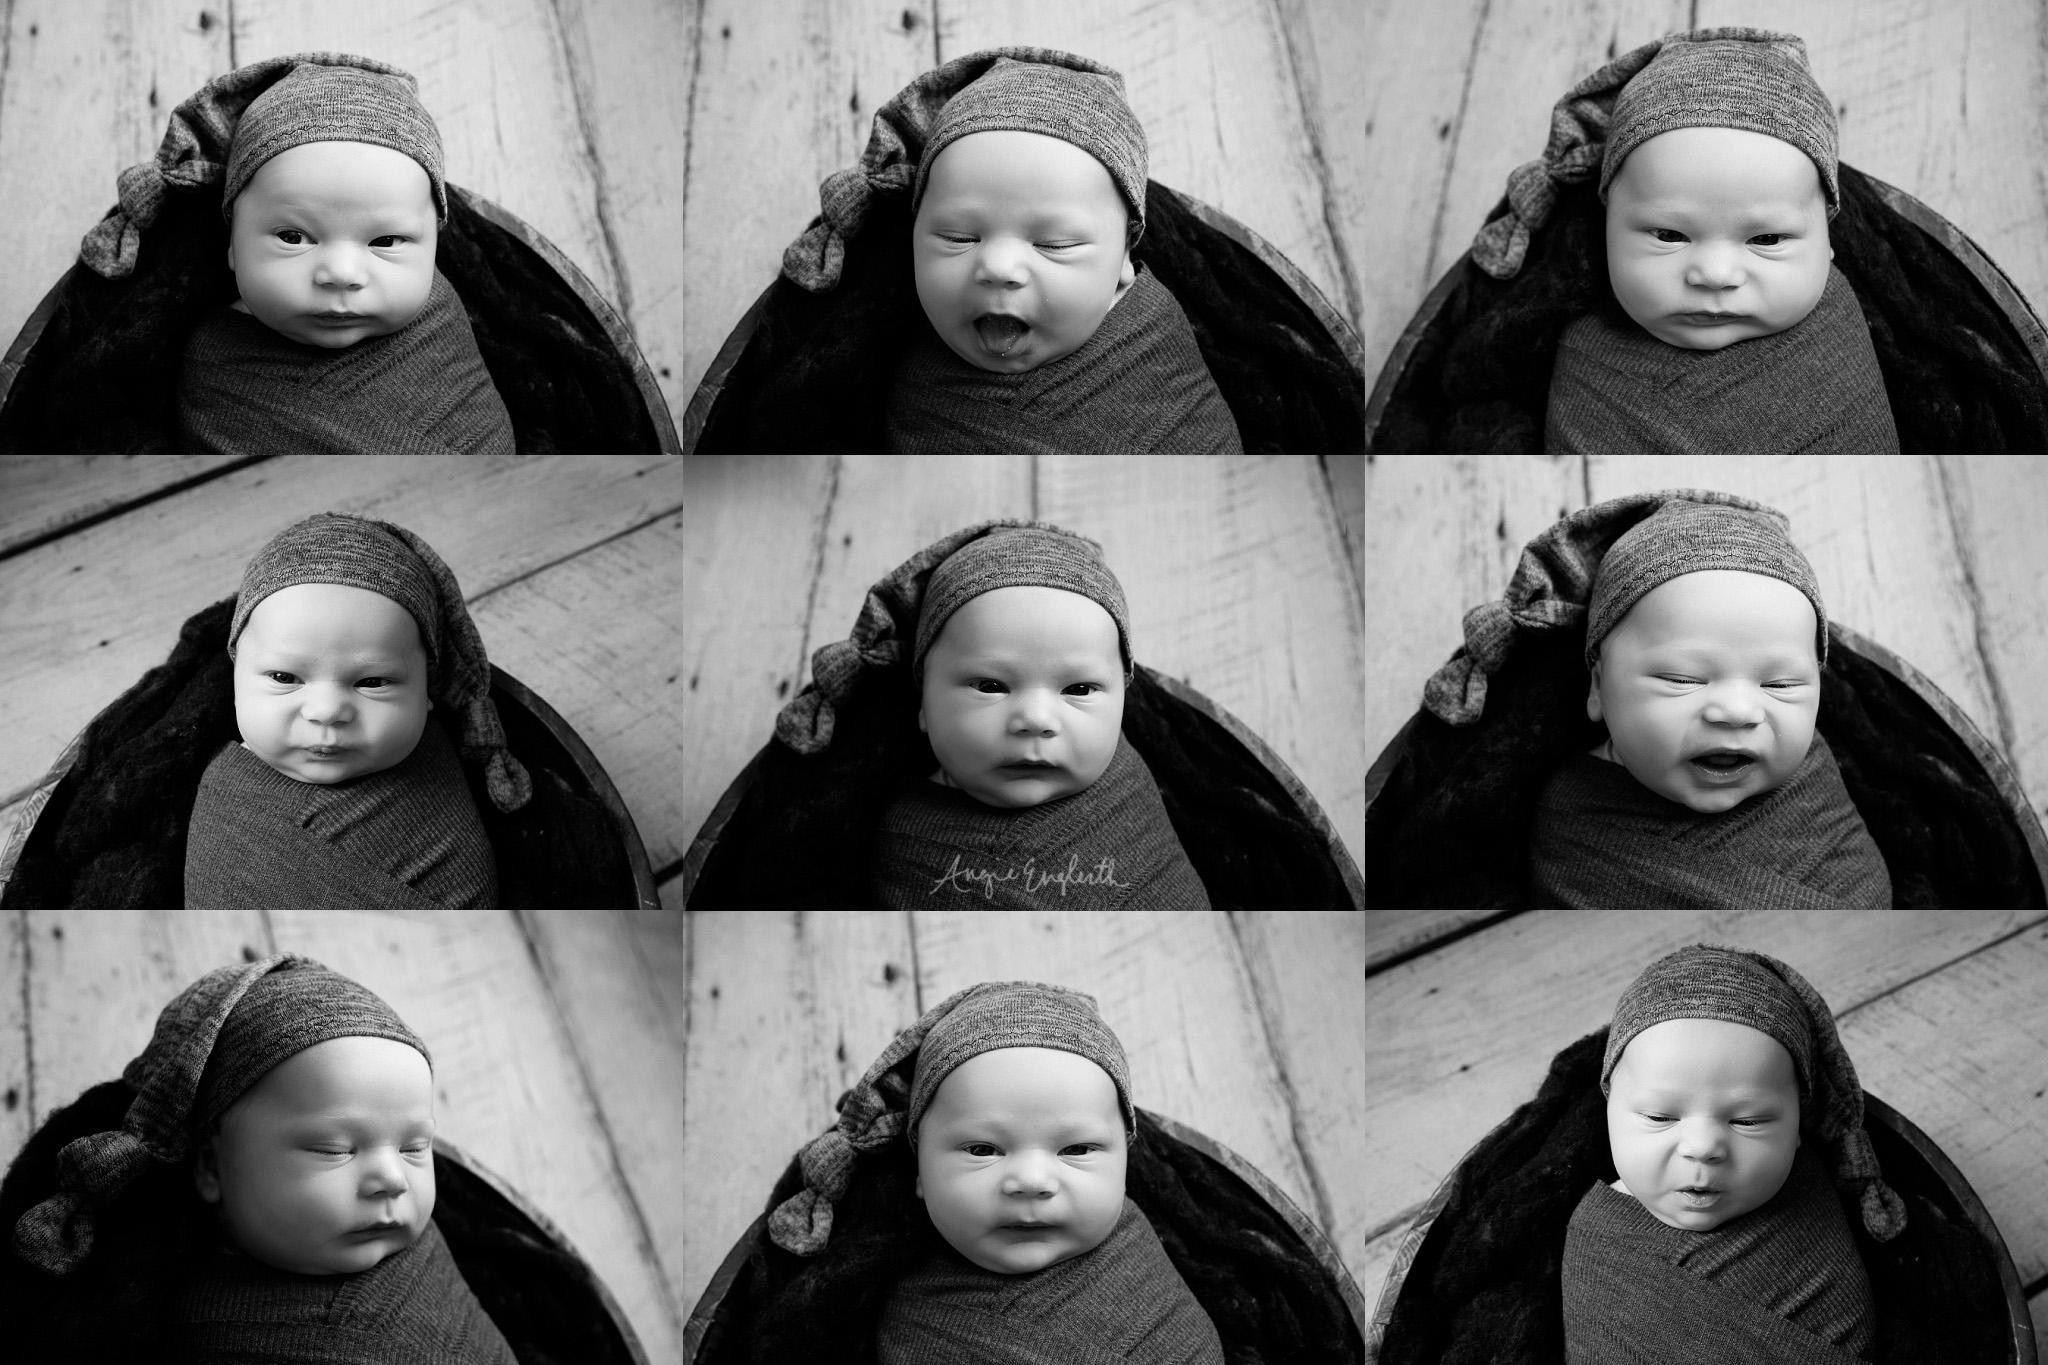 lancaster_newborn_photographer_angie_englerth_central_pa_012.jpg